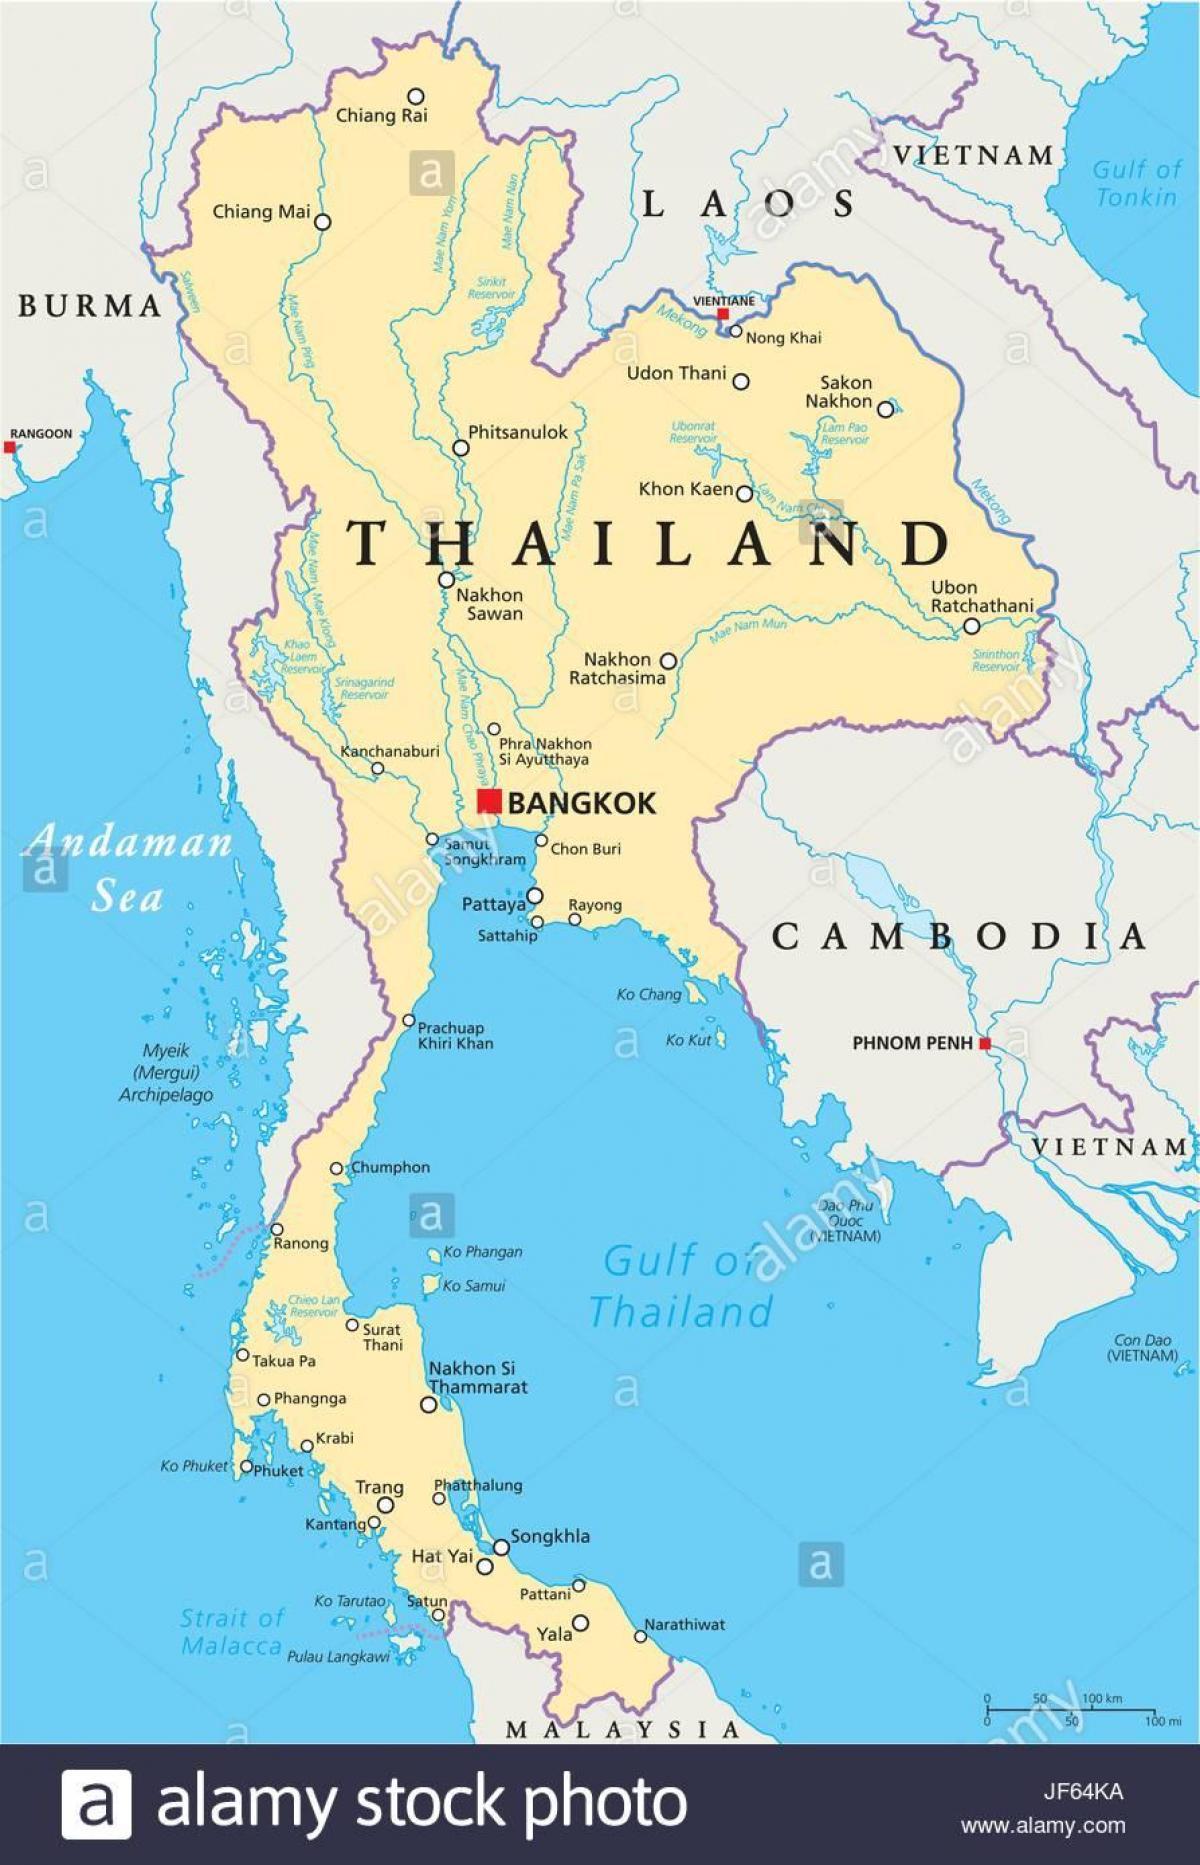 Bangkok Standort auf Weltkarte - Bangkok thailand world map (Thailand)